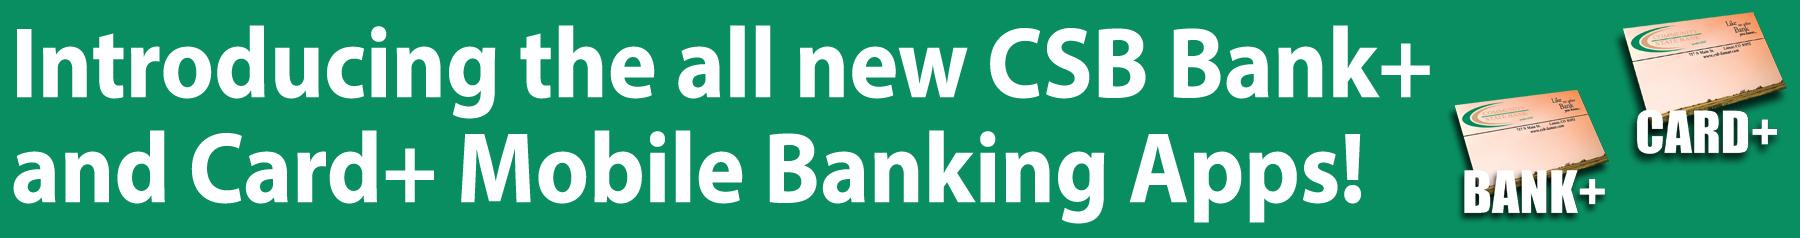 Bank+Stmtbanner